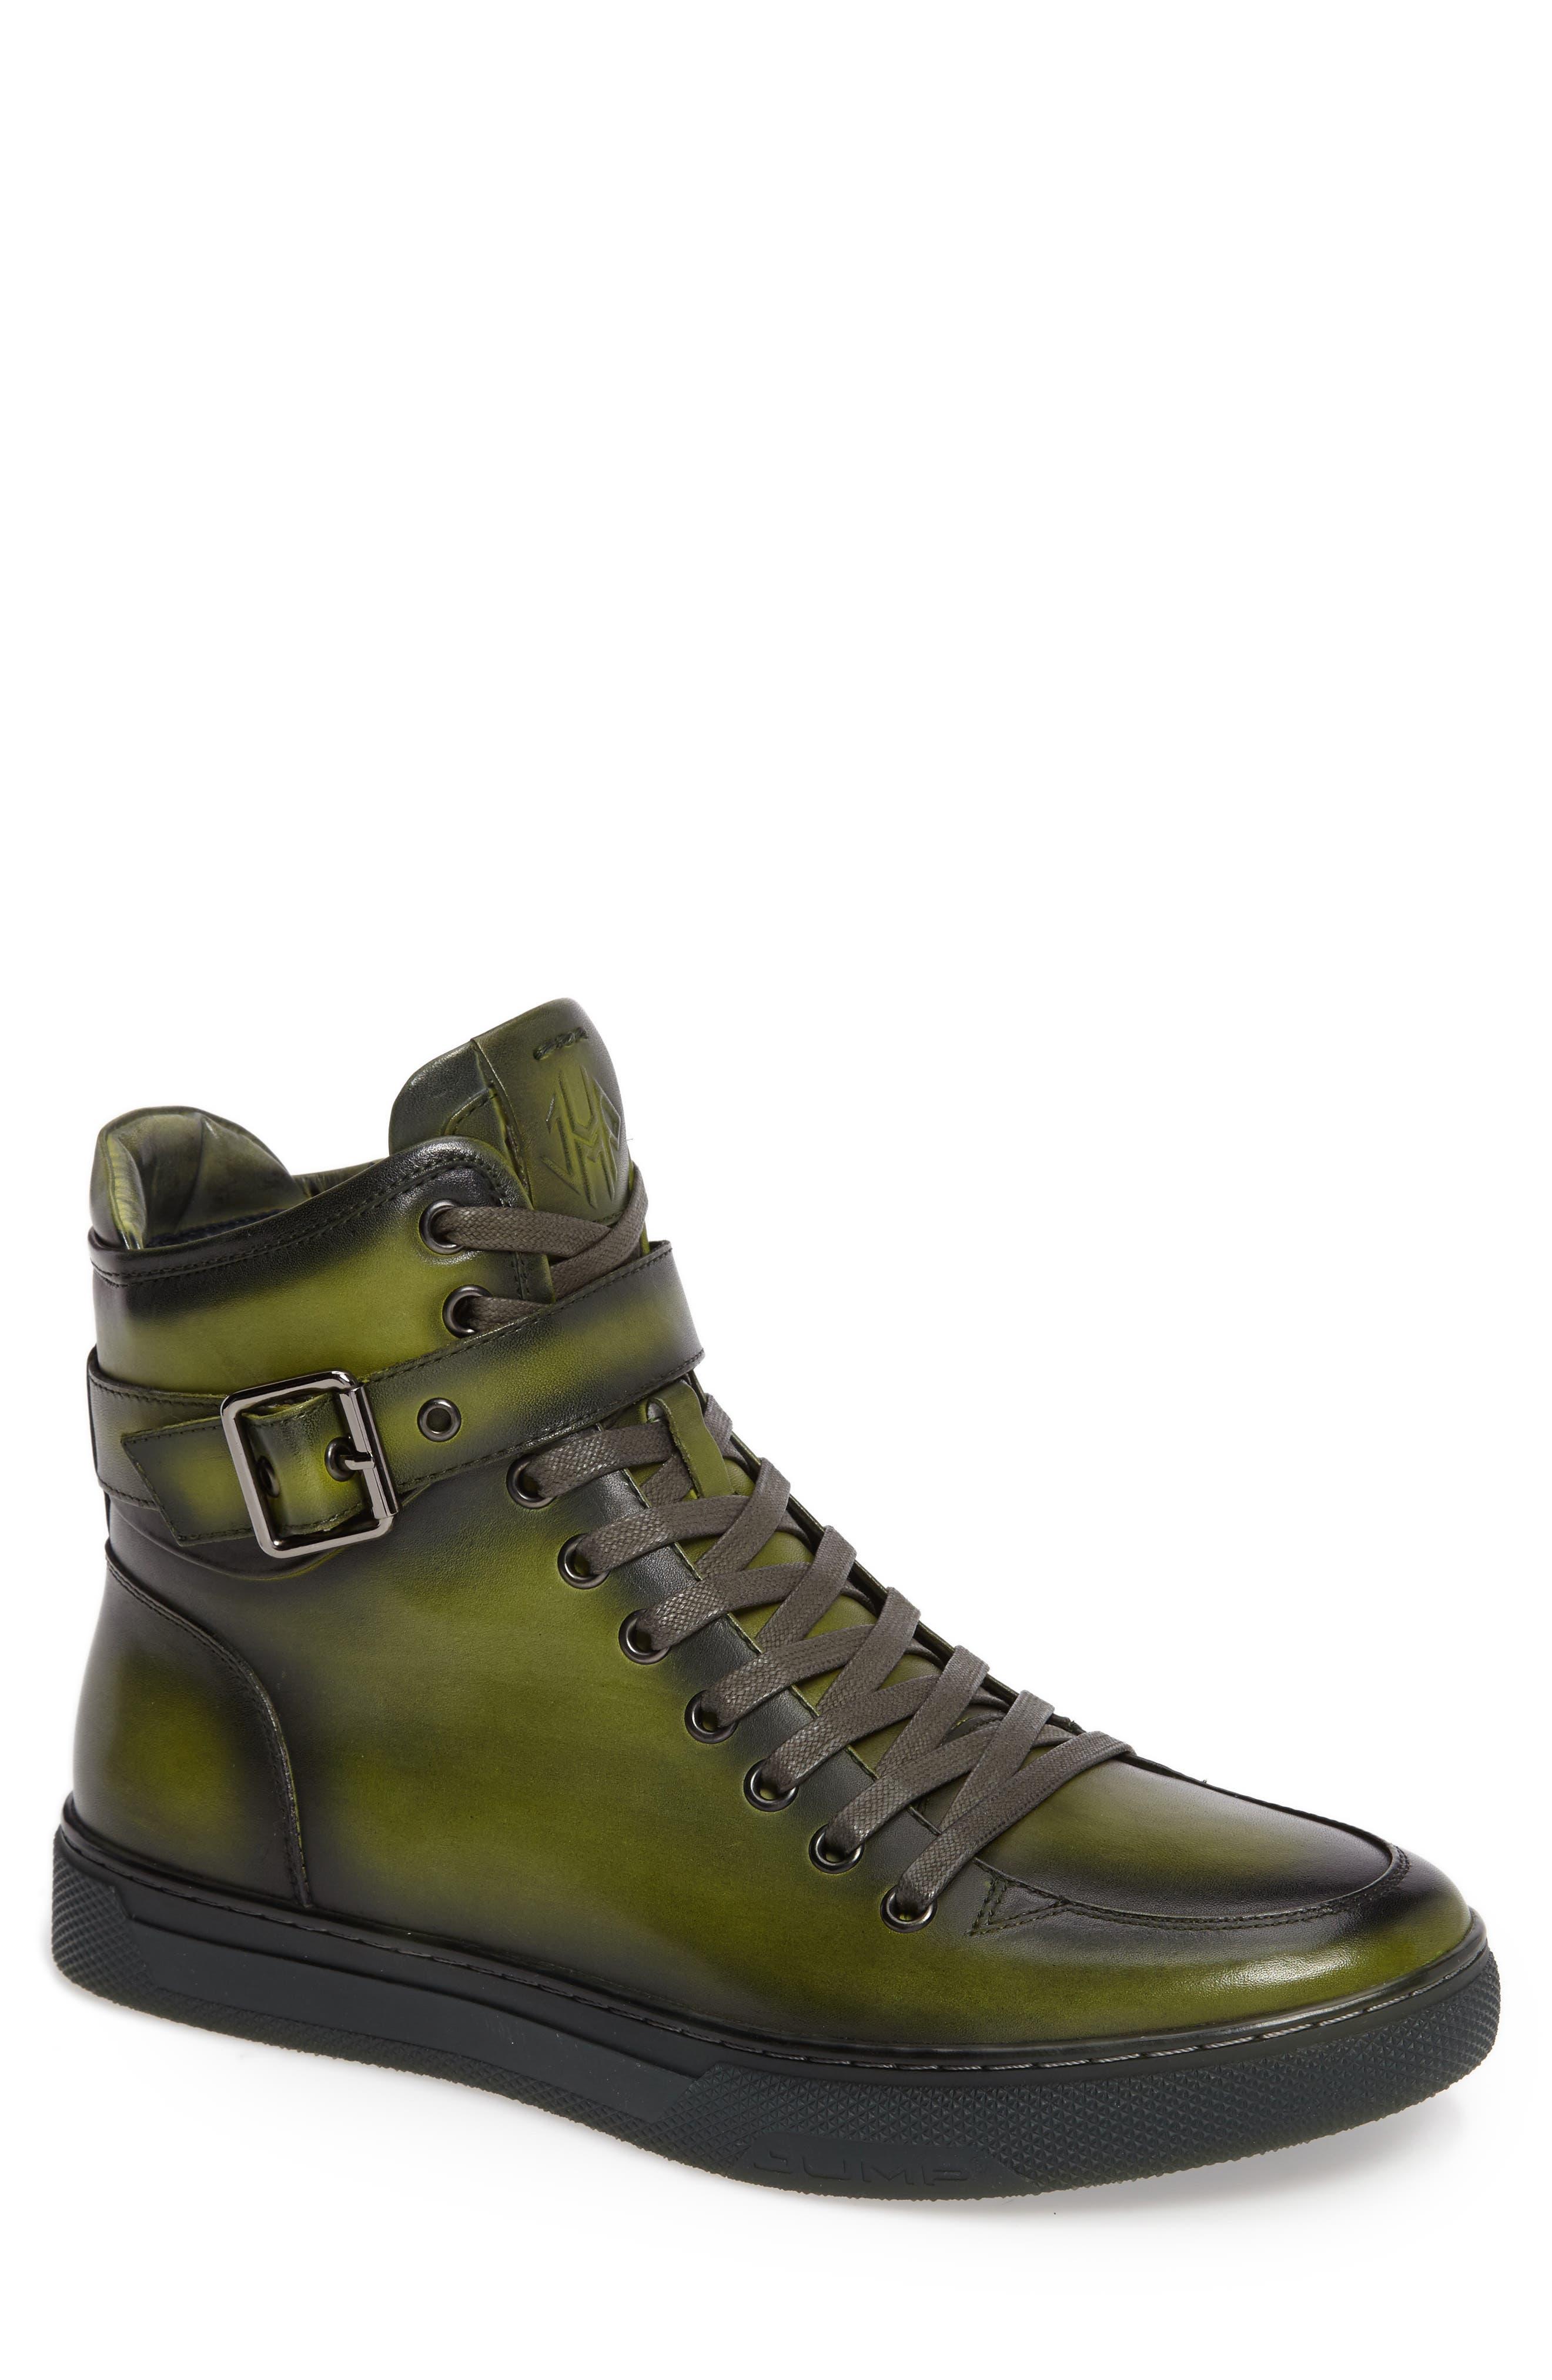 JUMP Sullivan High Top Sneaker, Main, color, AMAZON GREEN